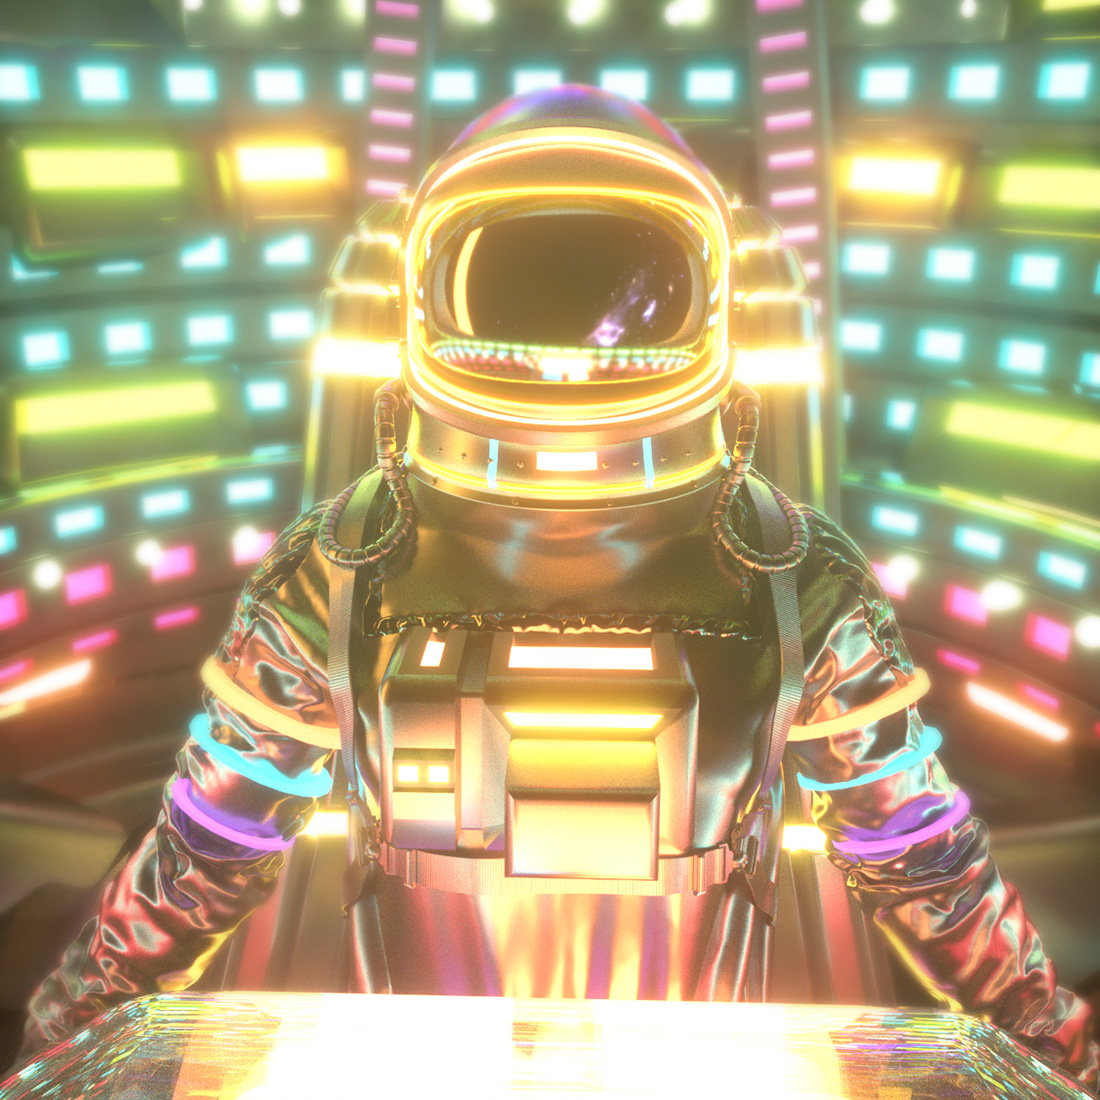 Astrohead_01_10_0090